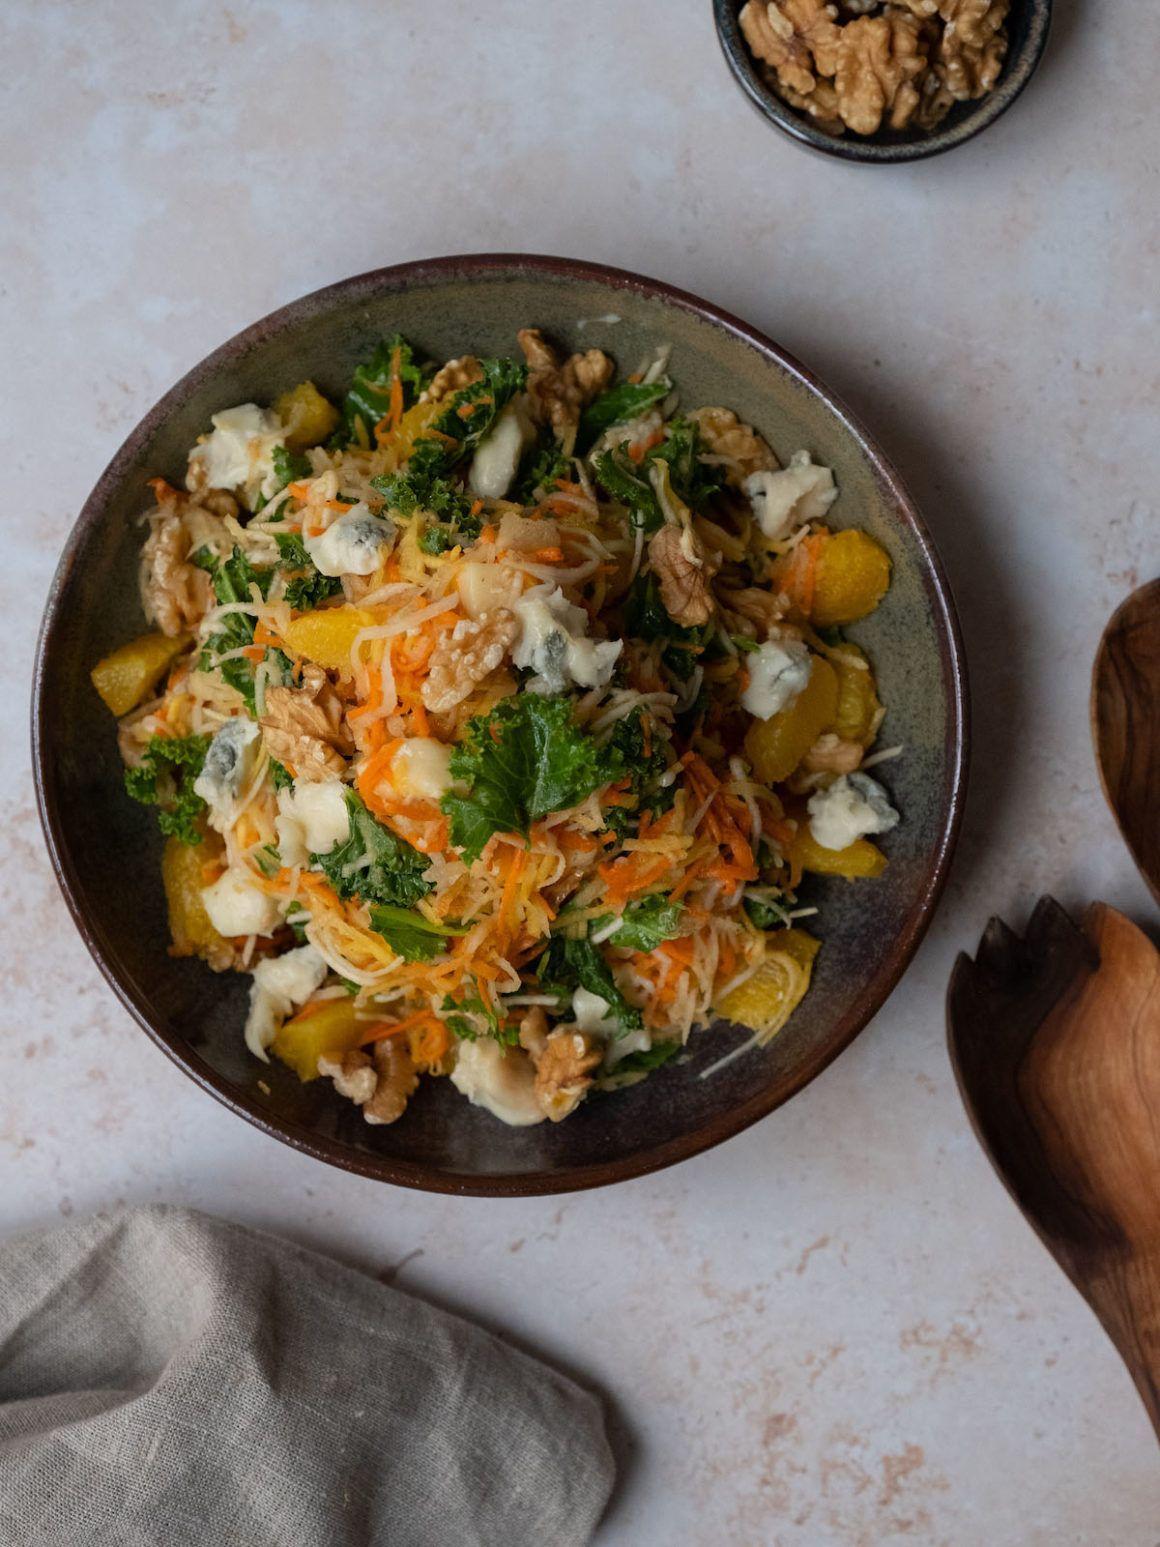 Foodblog, About Fuel, Rezept, Orangenfilets, Grünkohl, Birne, Wintersalat, Walnüssse